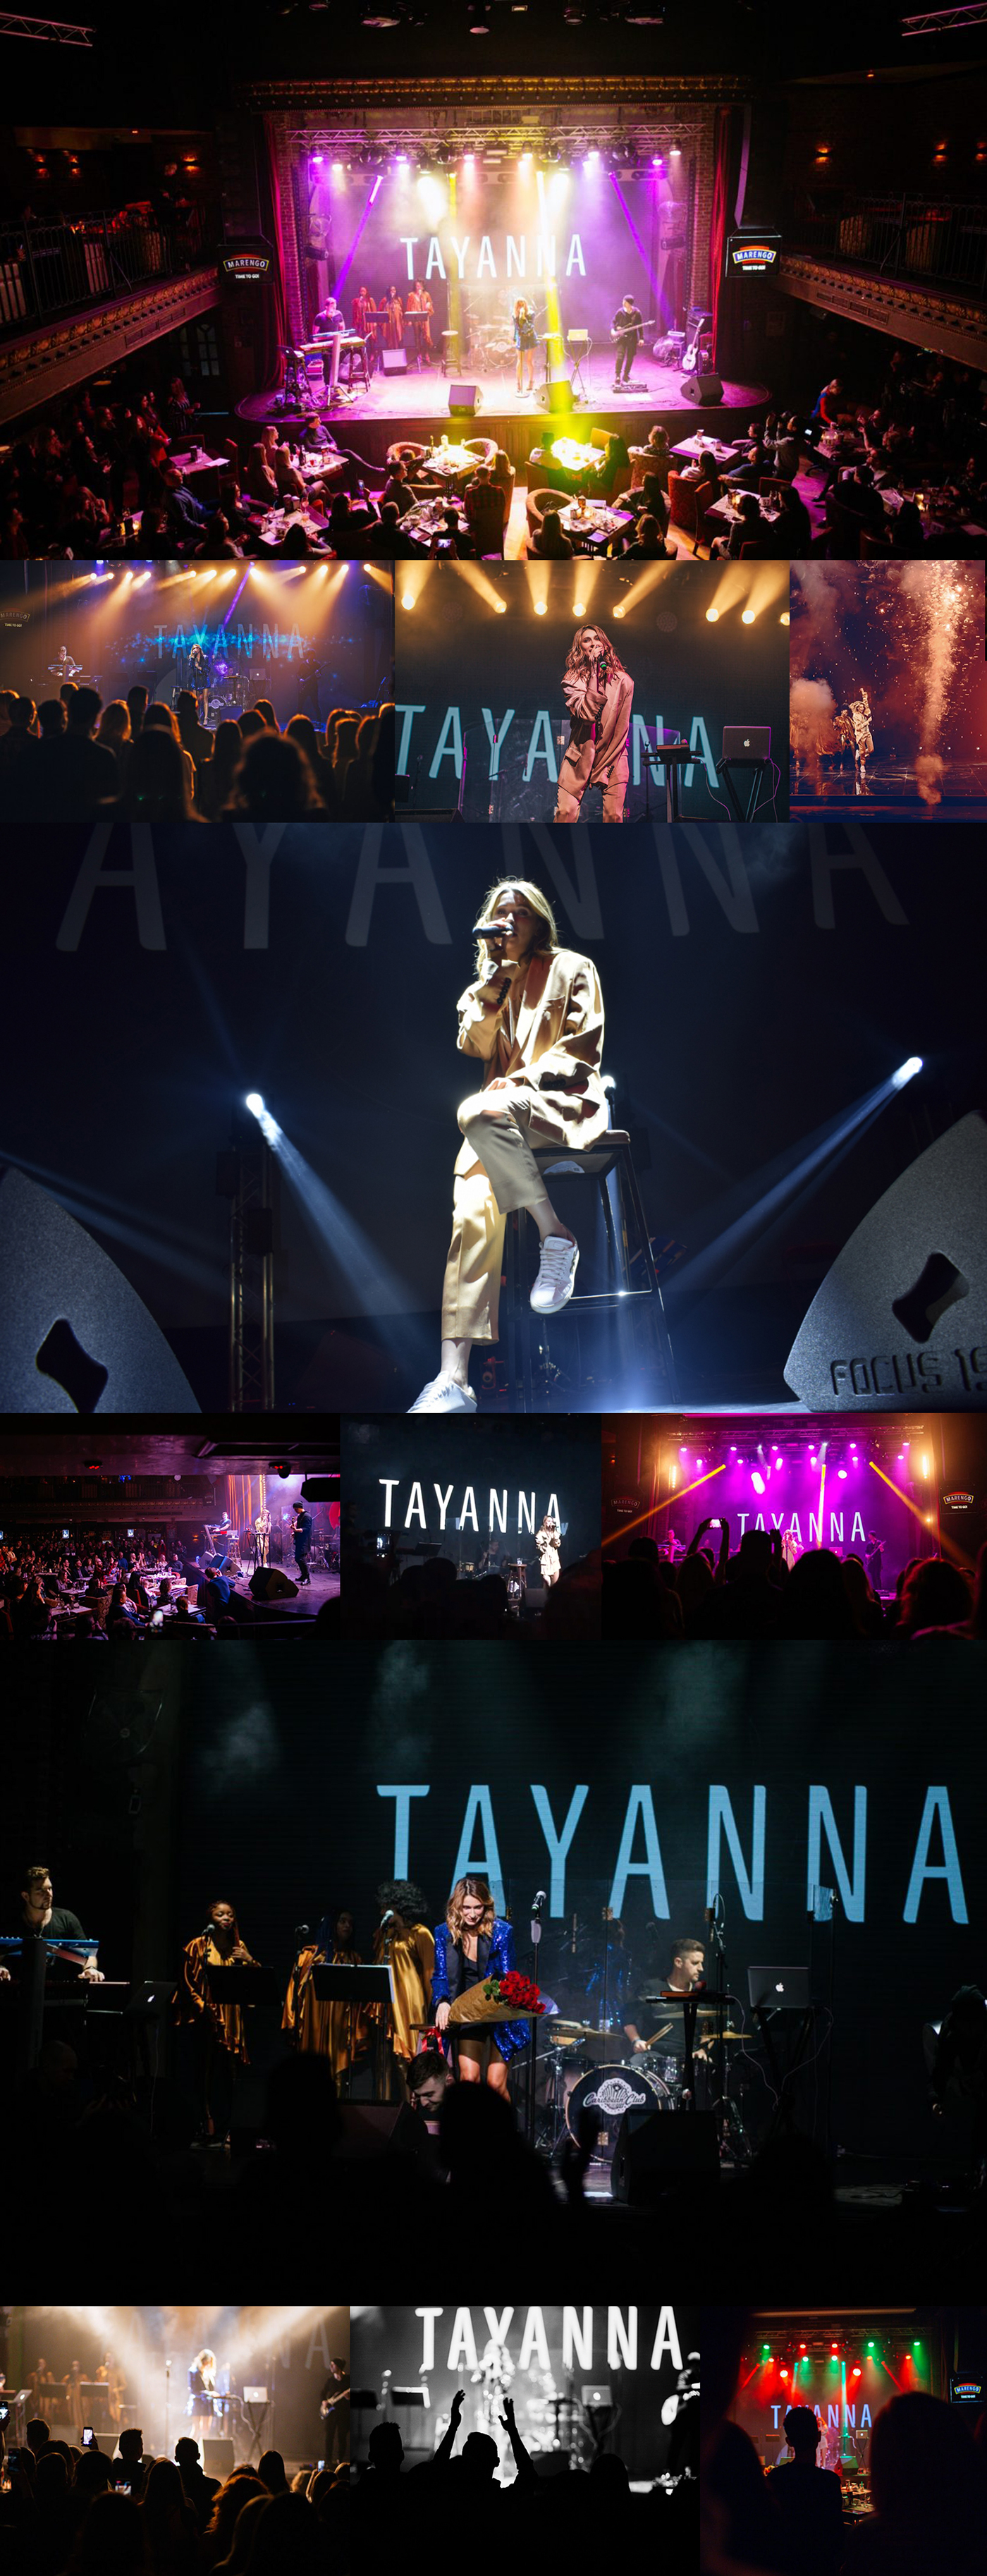 music Tayanna Singer ukraine украина Україна logo Logotype flower orchid